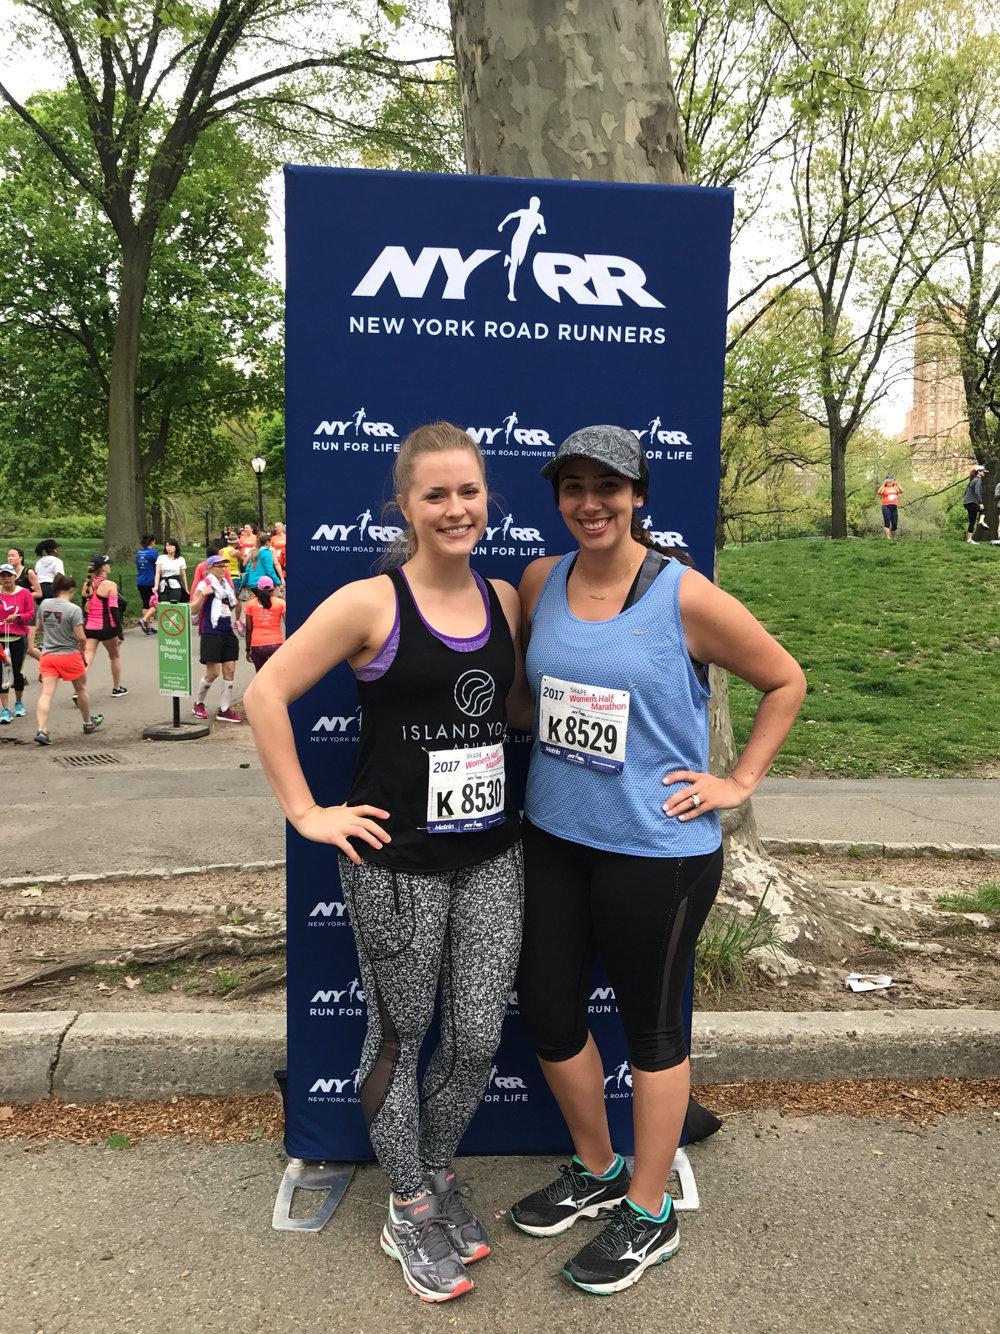 shape half marathon - prior to diving into our full marathon training, Lianna + I participated in the #womenruntheworld half by Shape Magazine